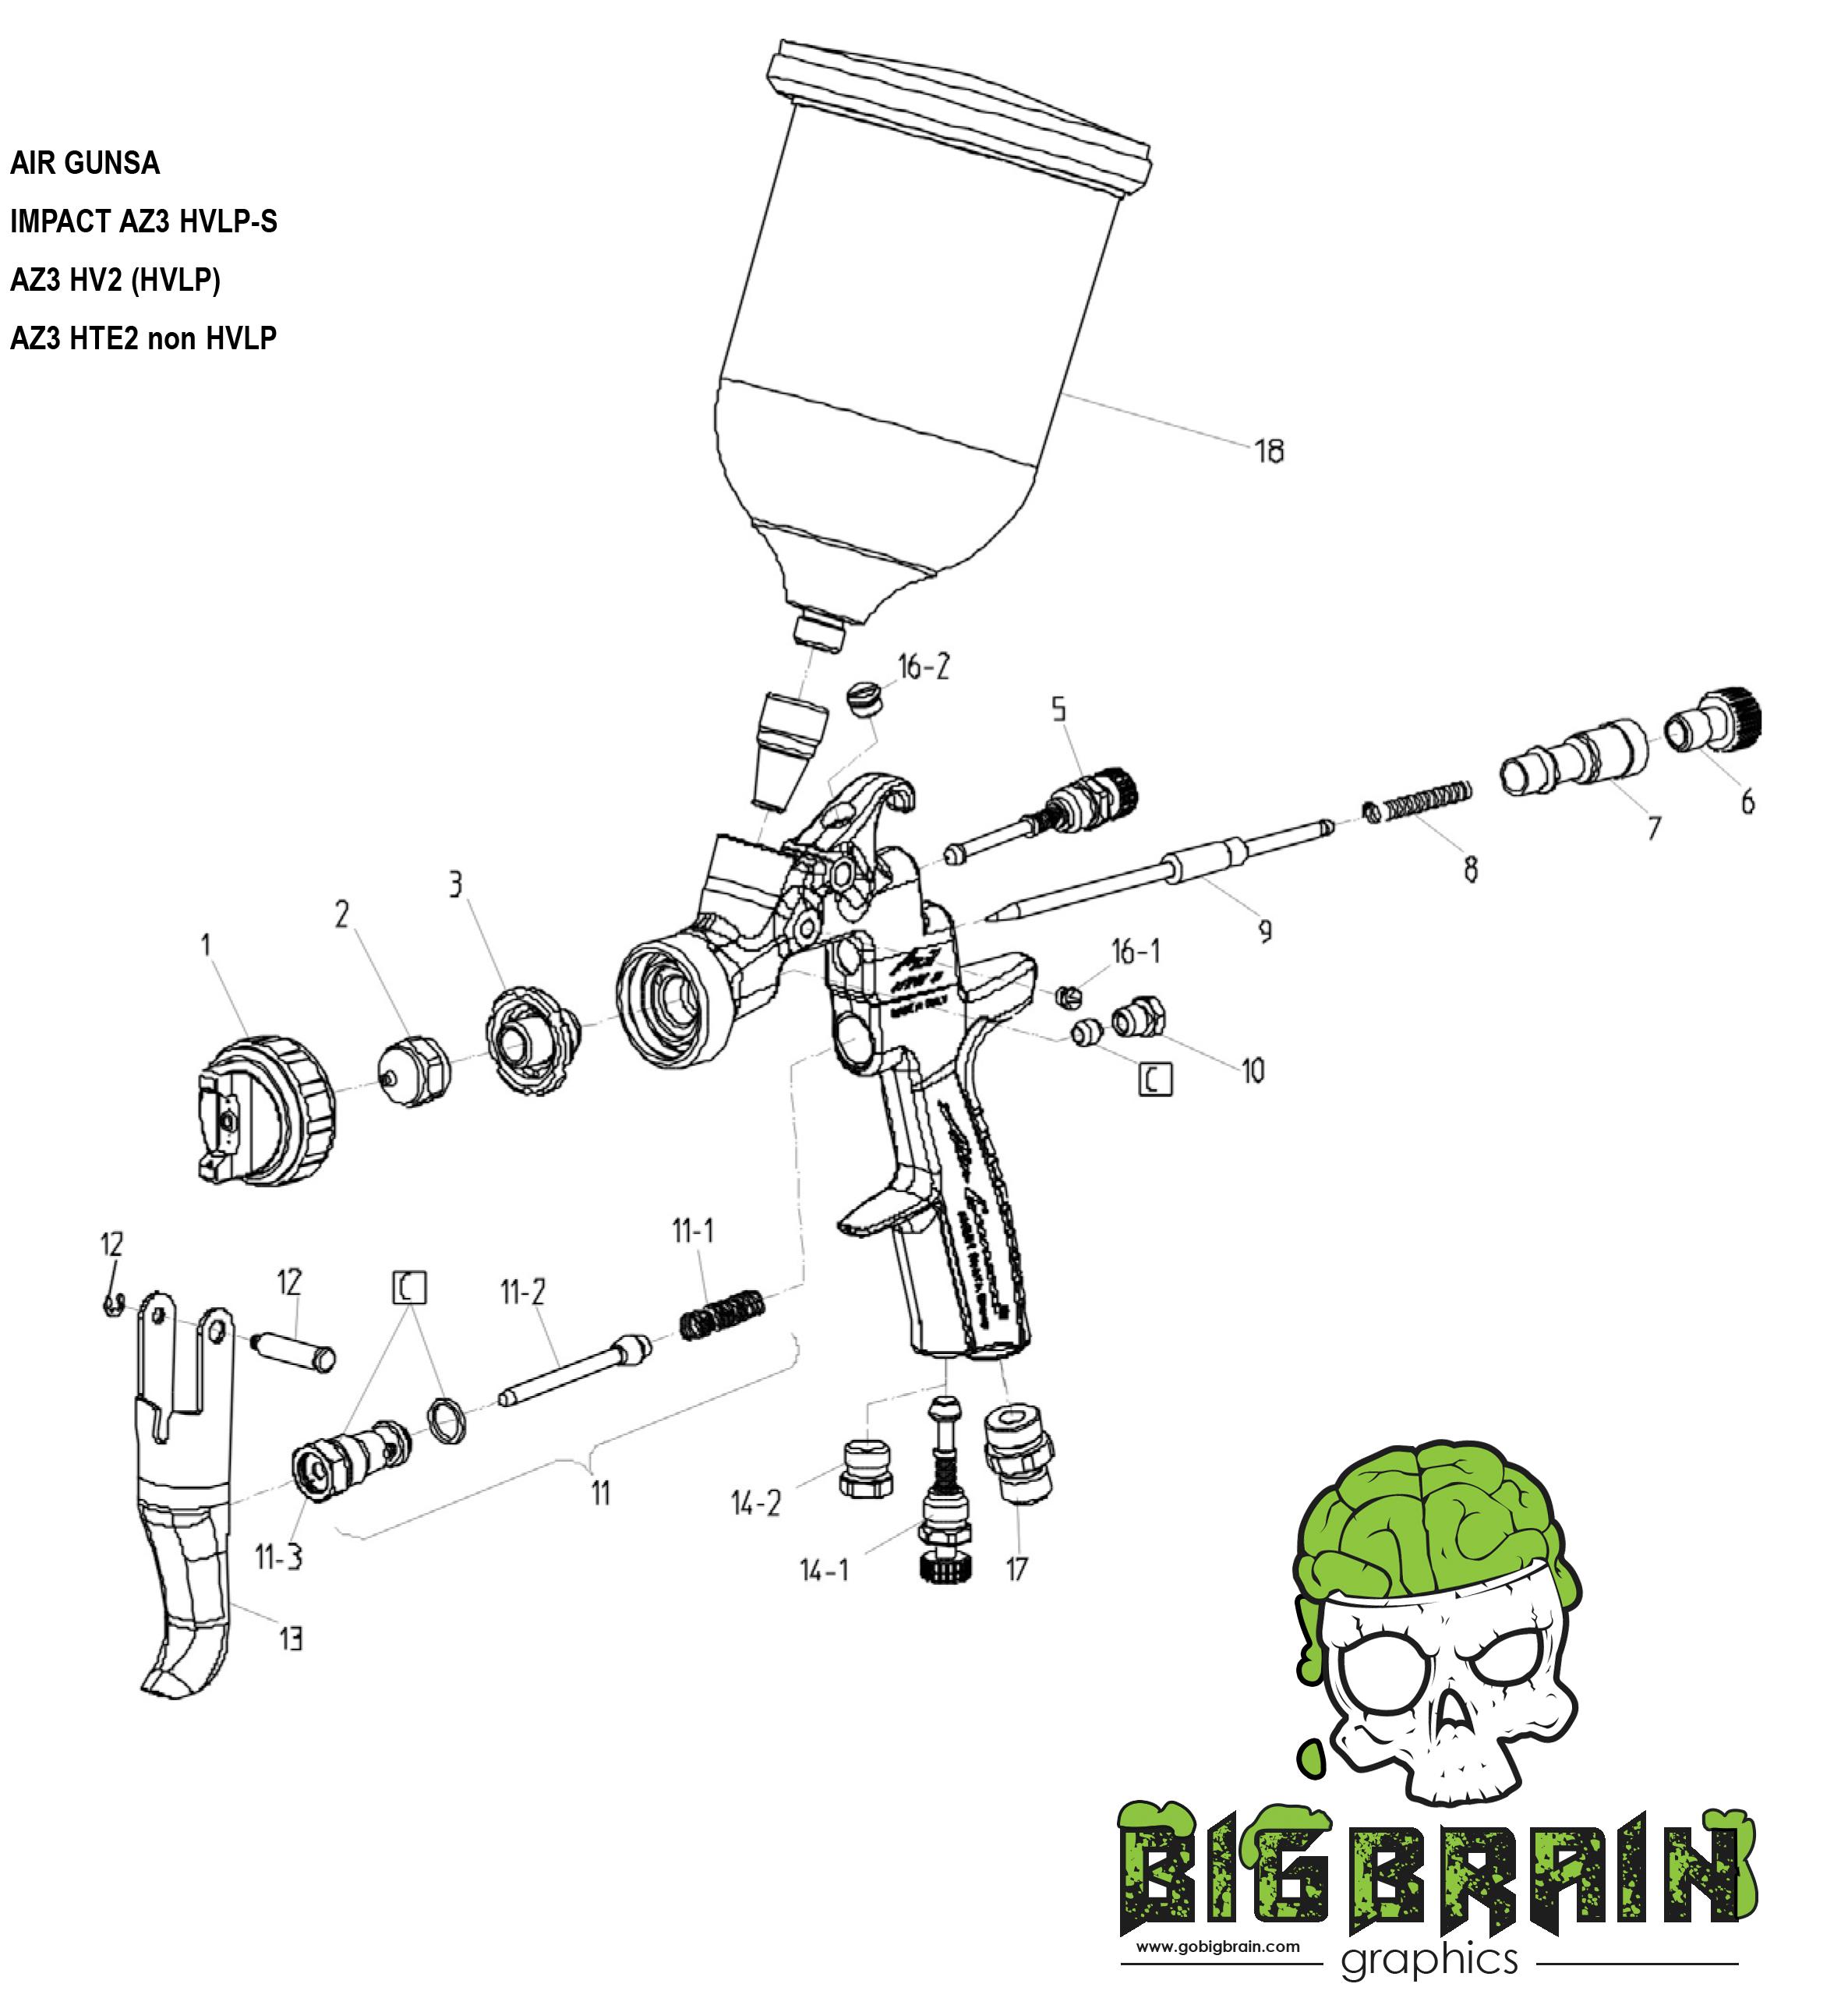 az3hv2-3-gunza-parts-list-air-gunsa-big-brain-graphics-replacement-pieces-list.jpg